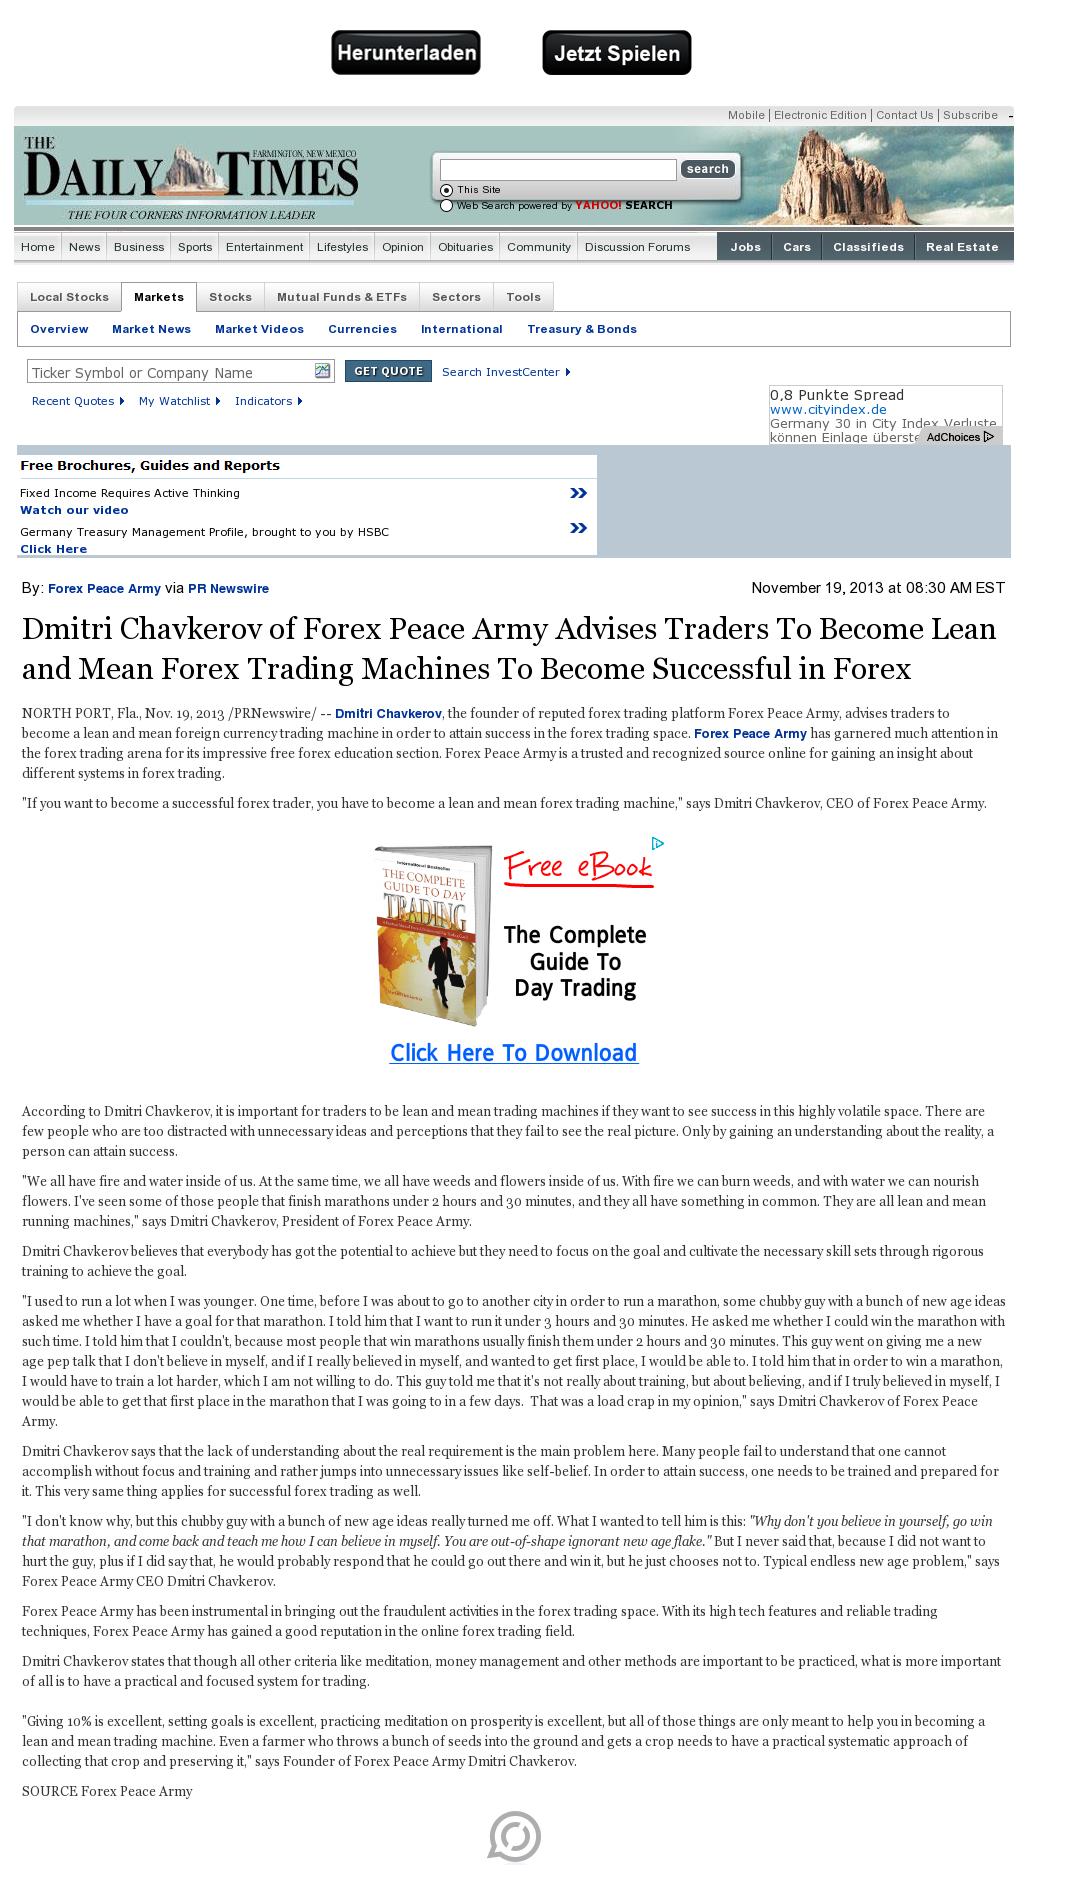 Dmitri Chavkerov - Farmington Daily Times (Farmington, NM) - Lean Forex Trading